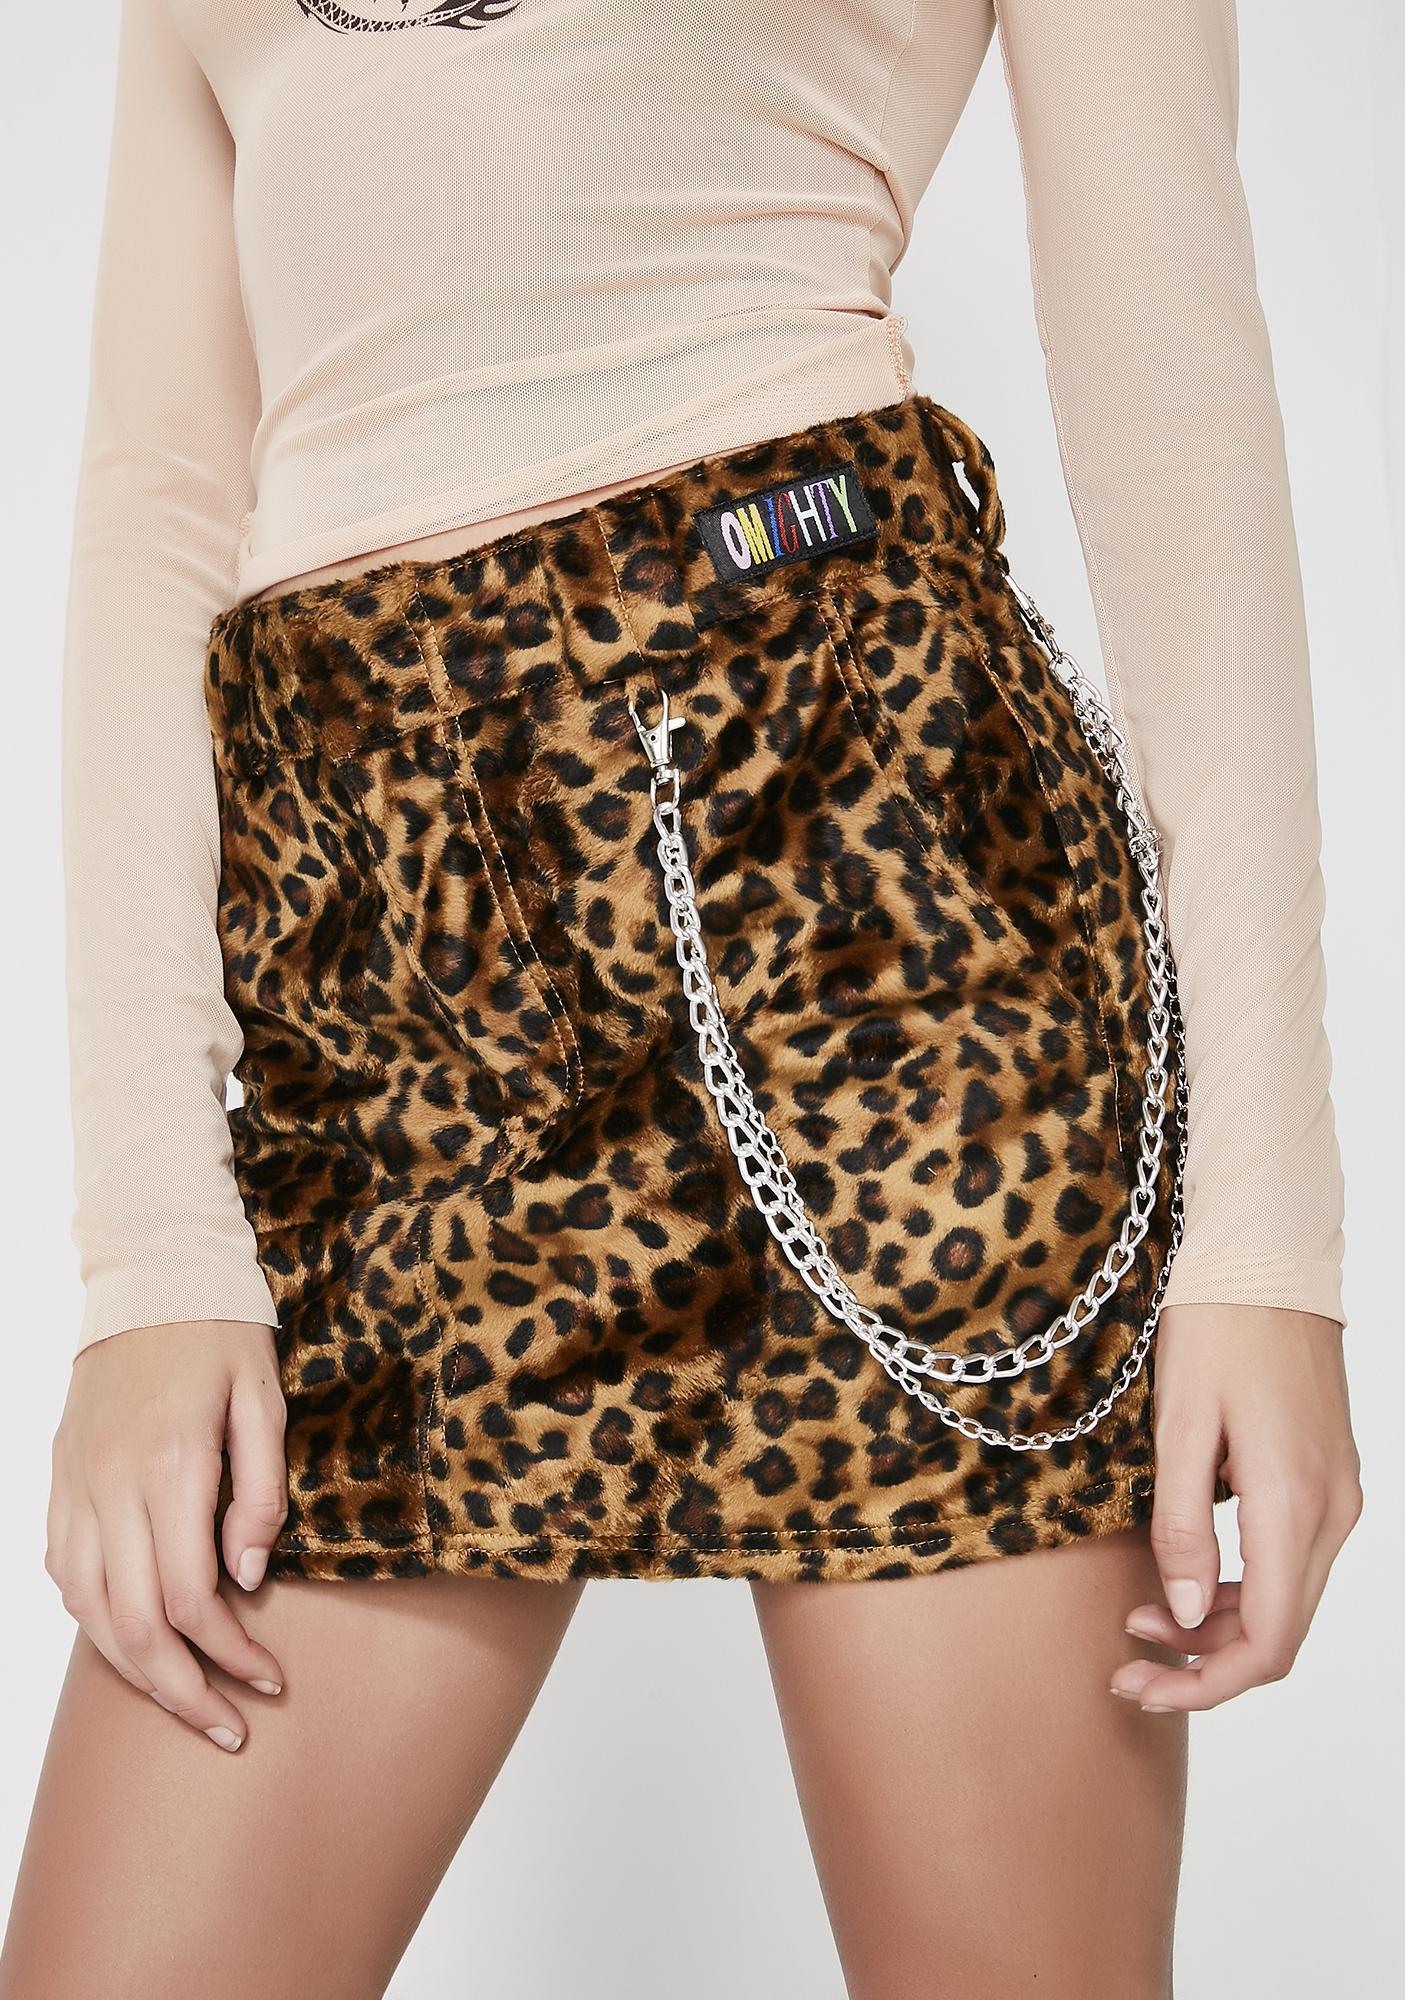 O Mighty Wildcat Chain Skirt